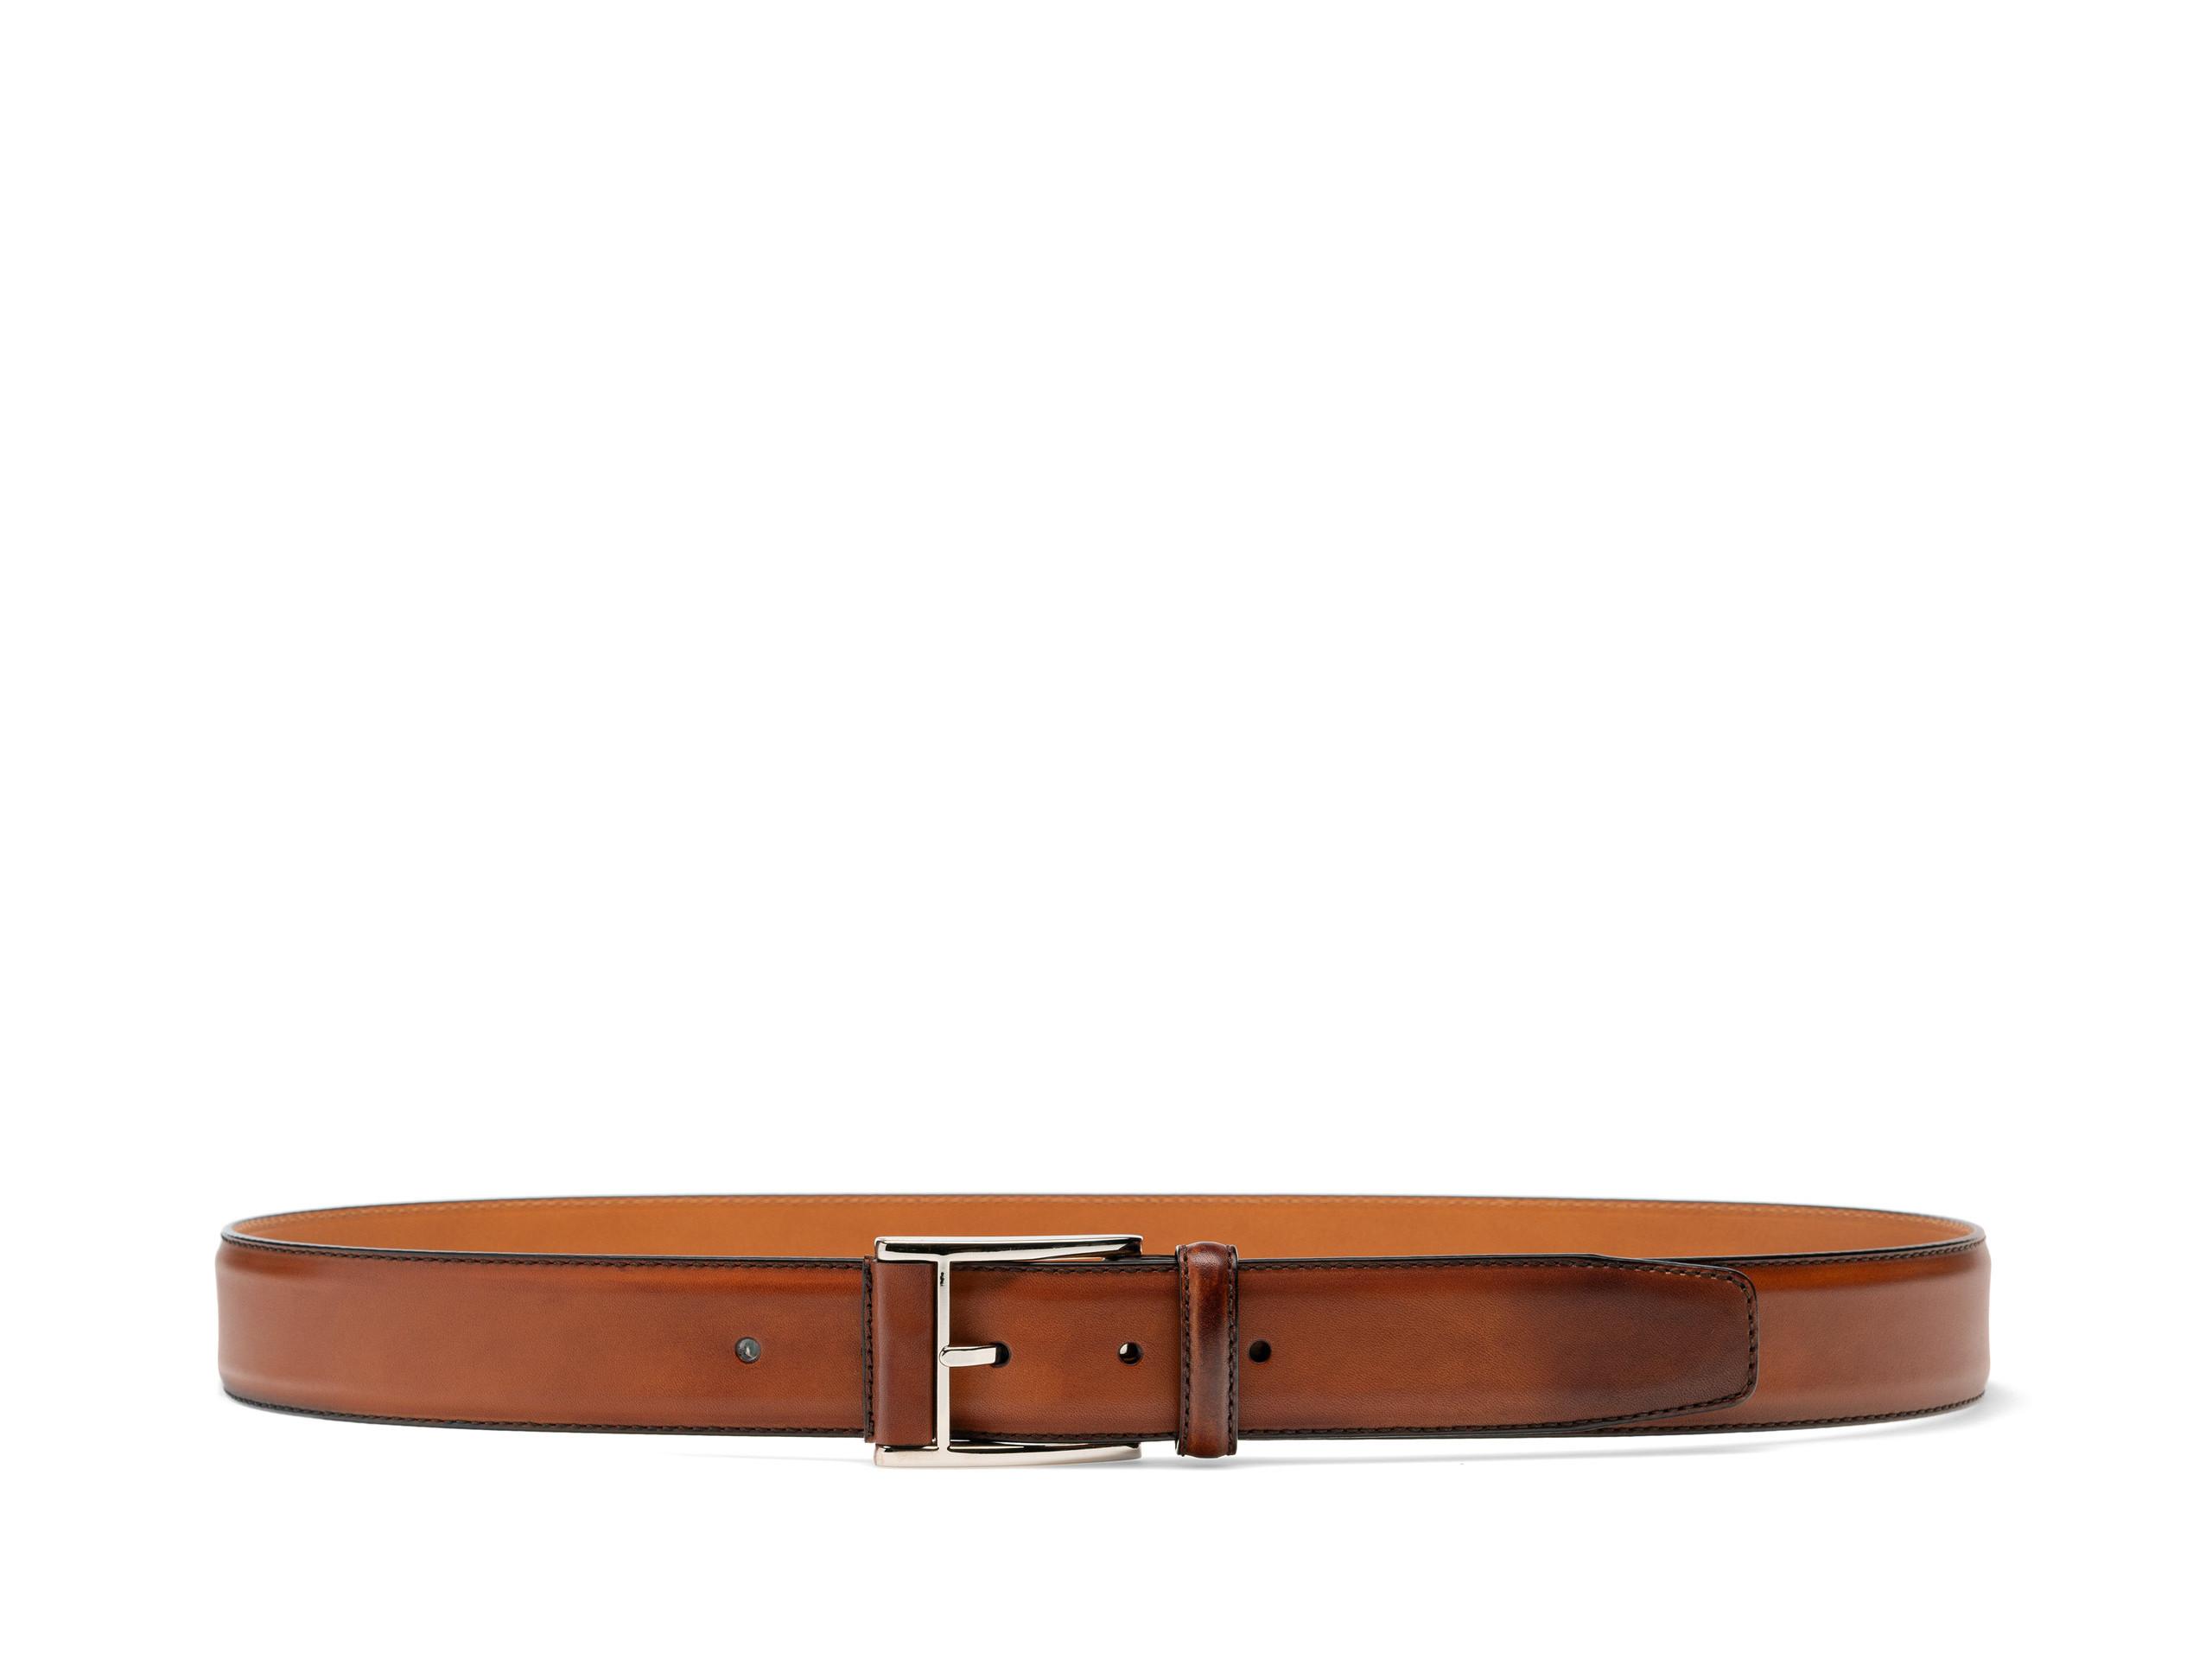 Side view of the Velaz Cognac Belts